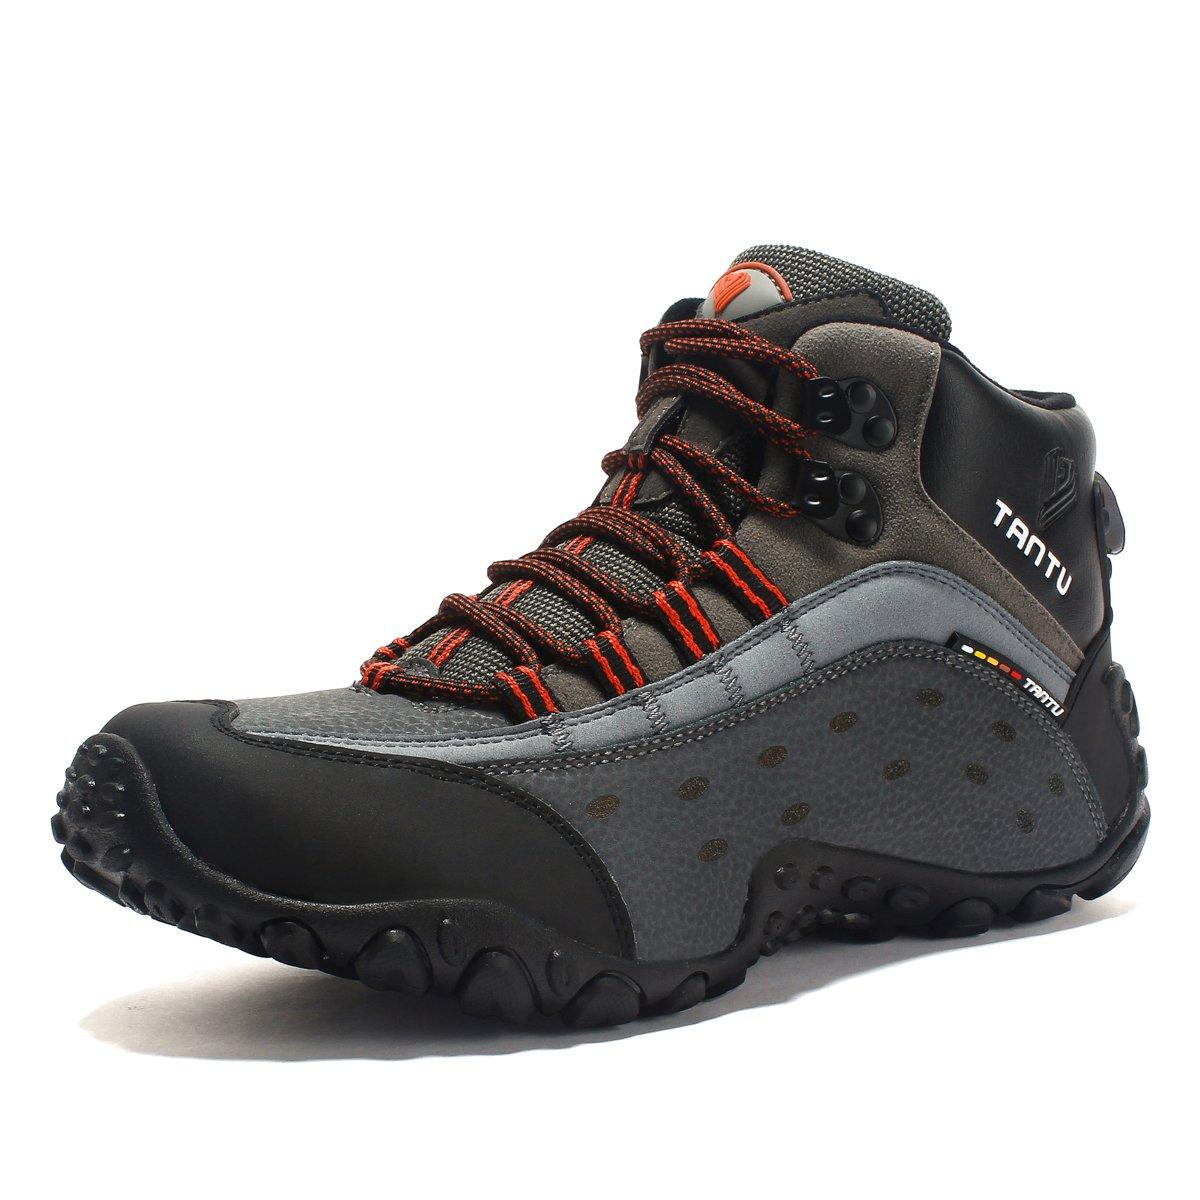 Herren Wanderschuhe Stiefel Männer Sportschuhe Outdoor Trekking Schuhe High-Top Wanderstiefel Hike Outdoorschuhe Wanderhalbschuhe